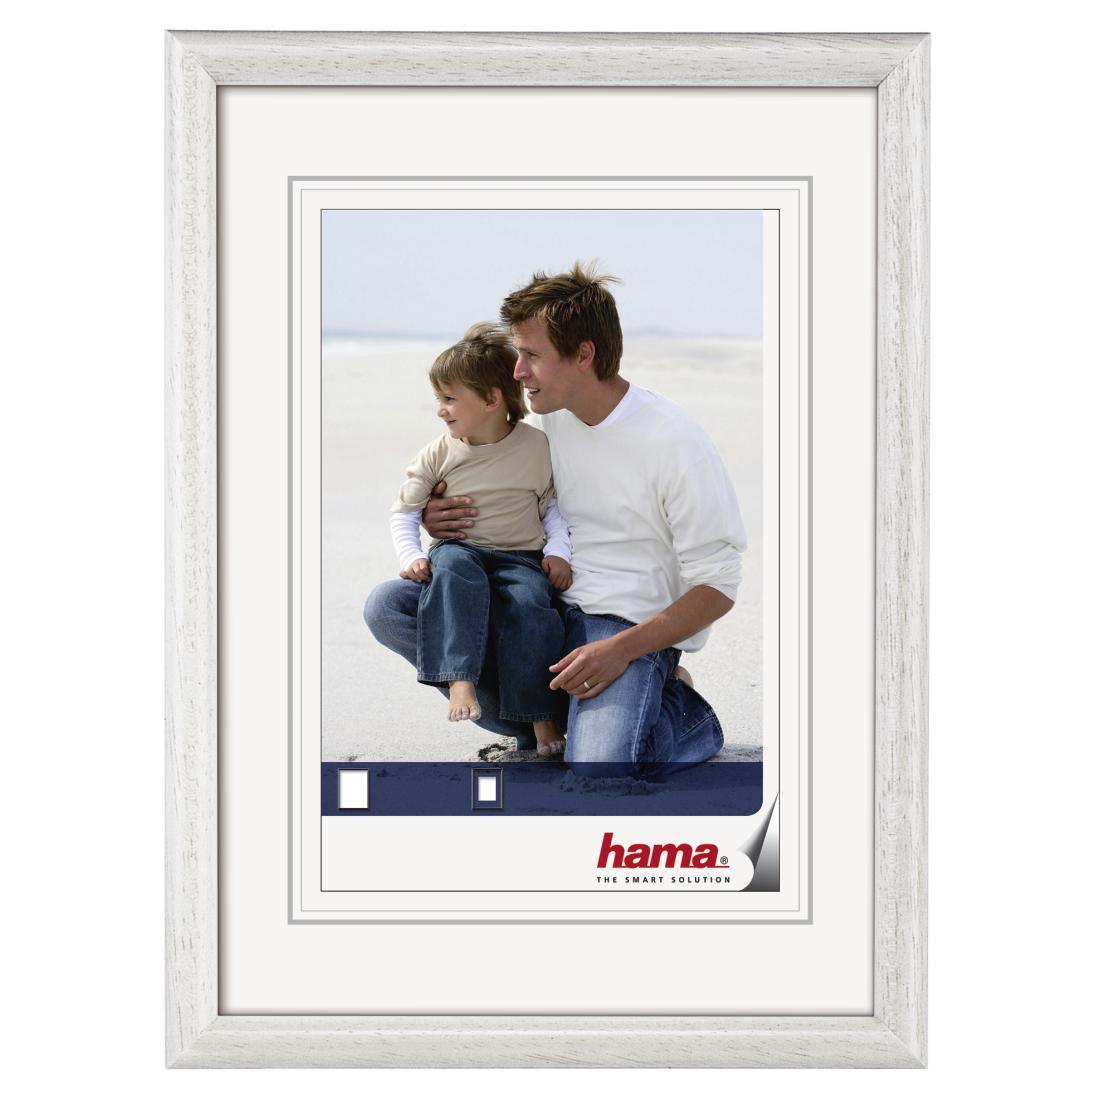 hama.at | 00064681 Hama Holzrahmen \